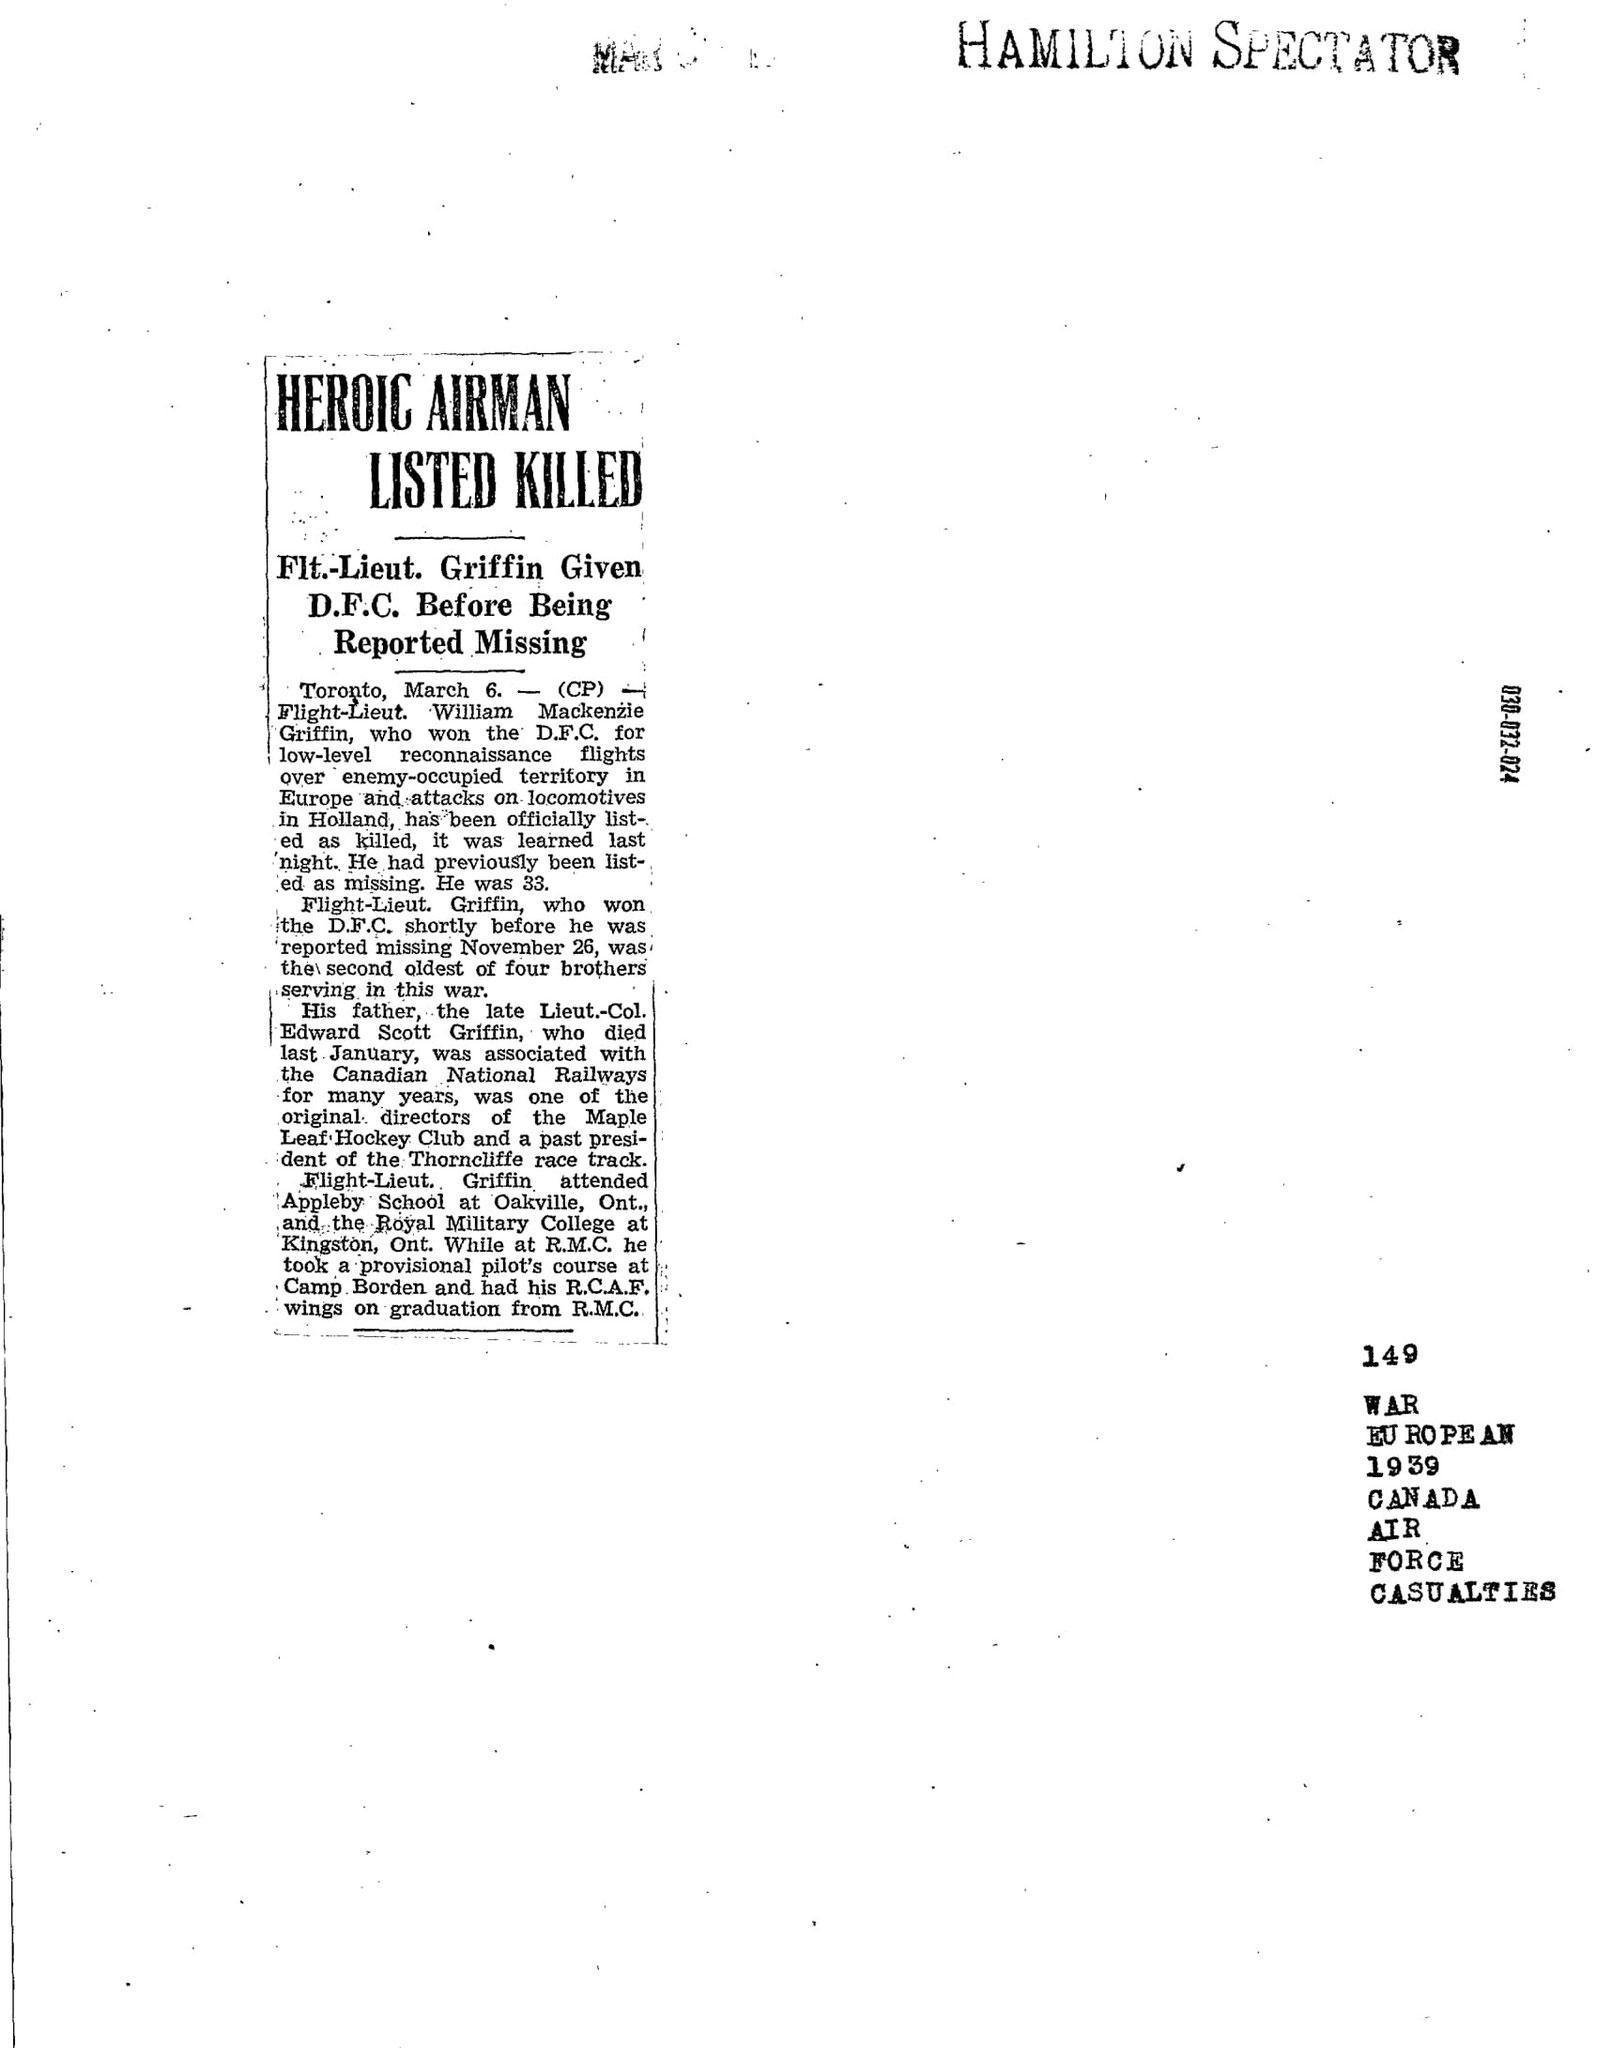 Hamlton Spectator 6-3-1943